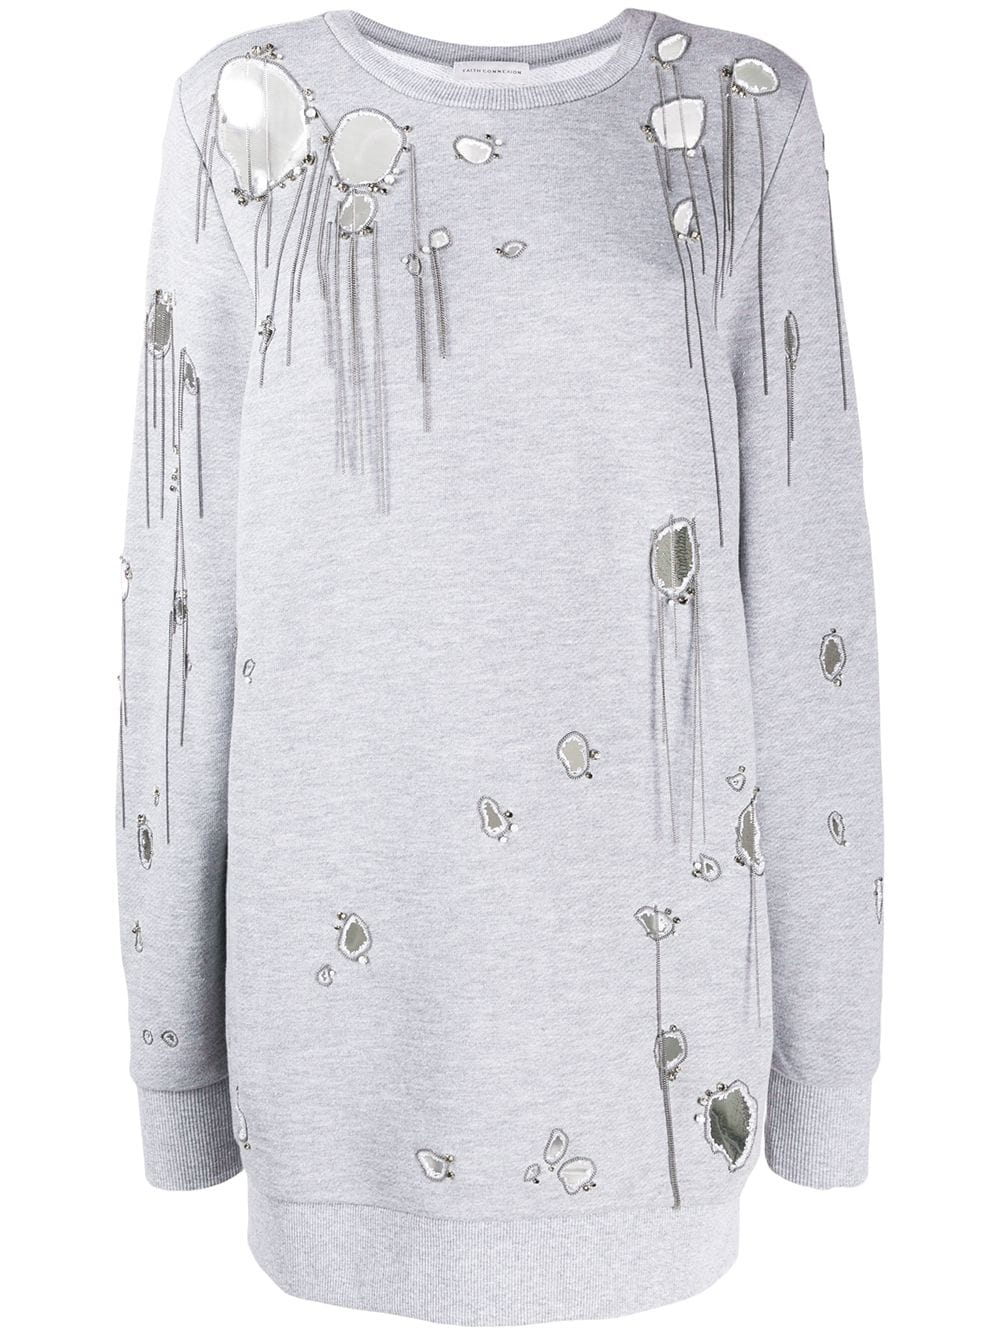 Long Ripped Sweatshirt